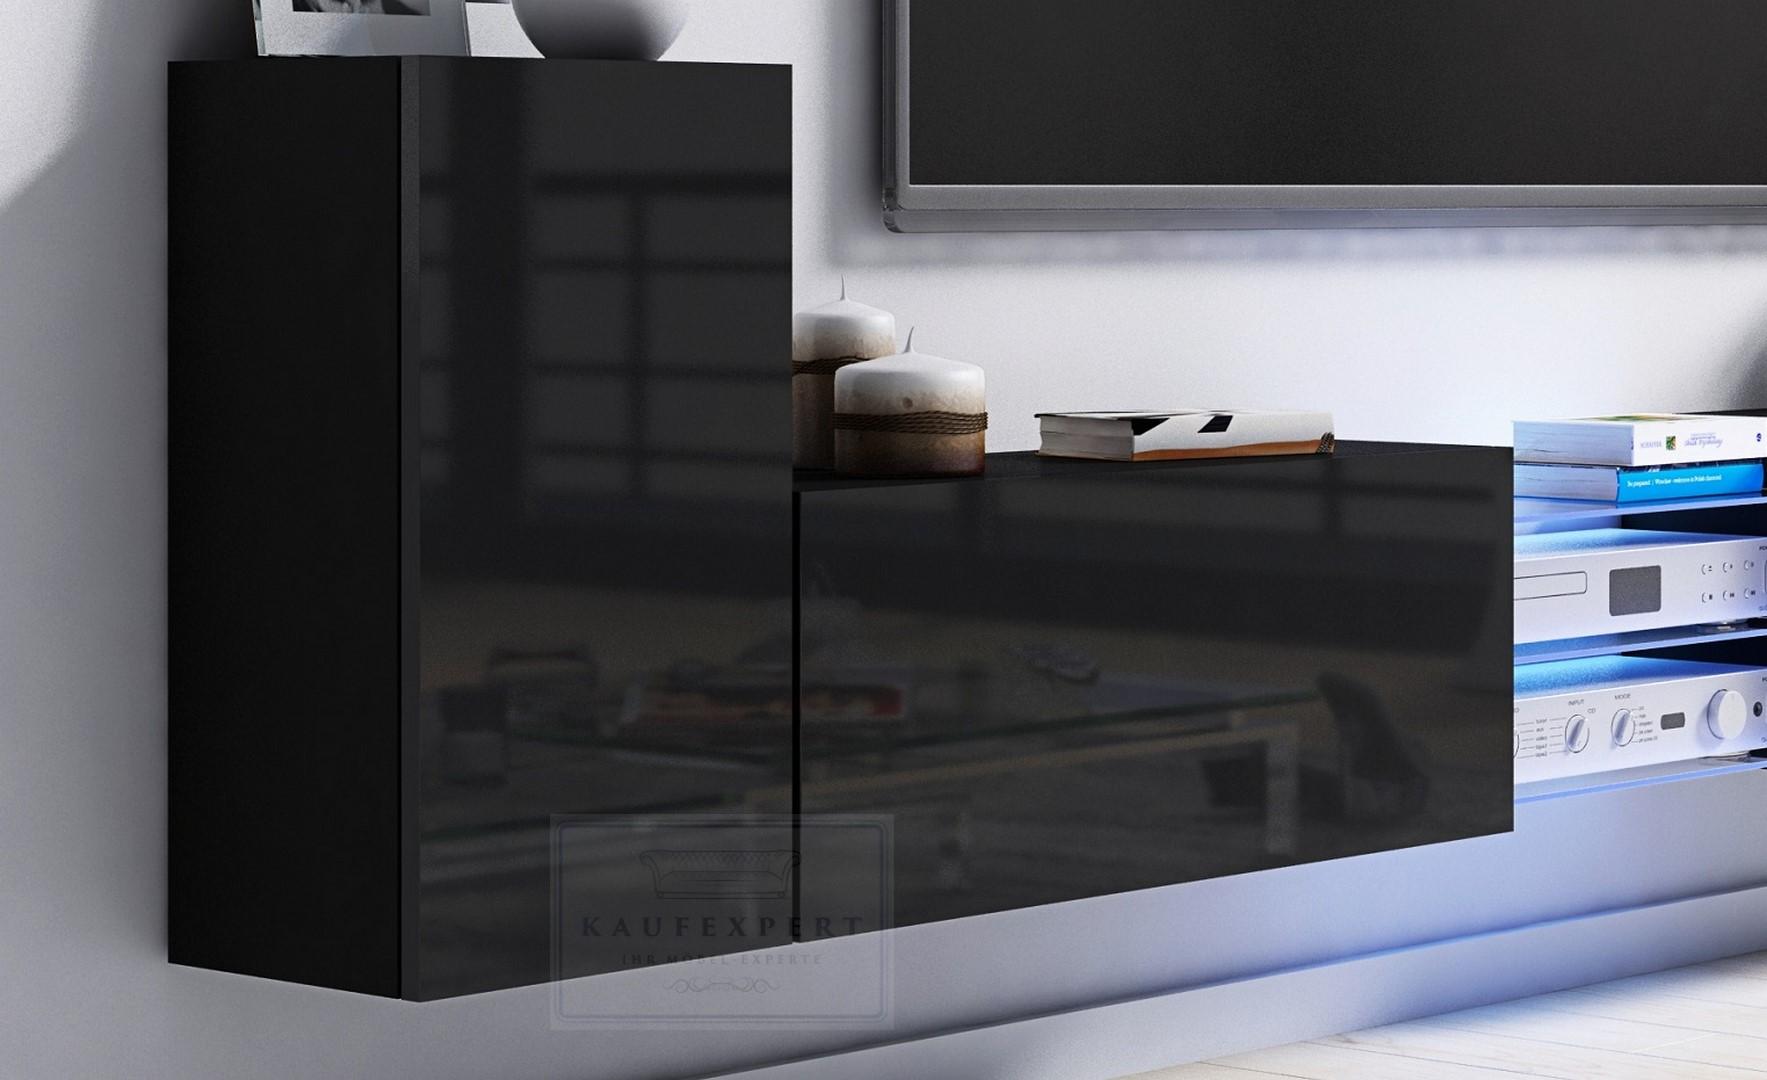 Kaufexpert Tv Lowboard Galaxy Grau Hochglanz Weiss Mdf Design